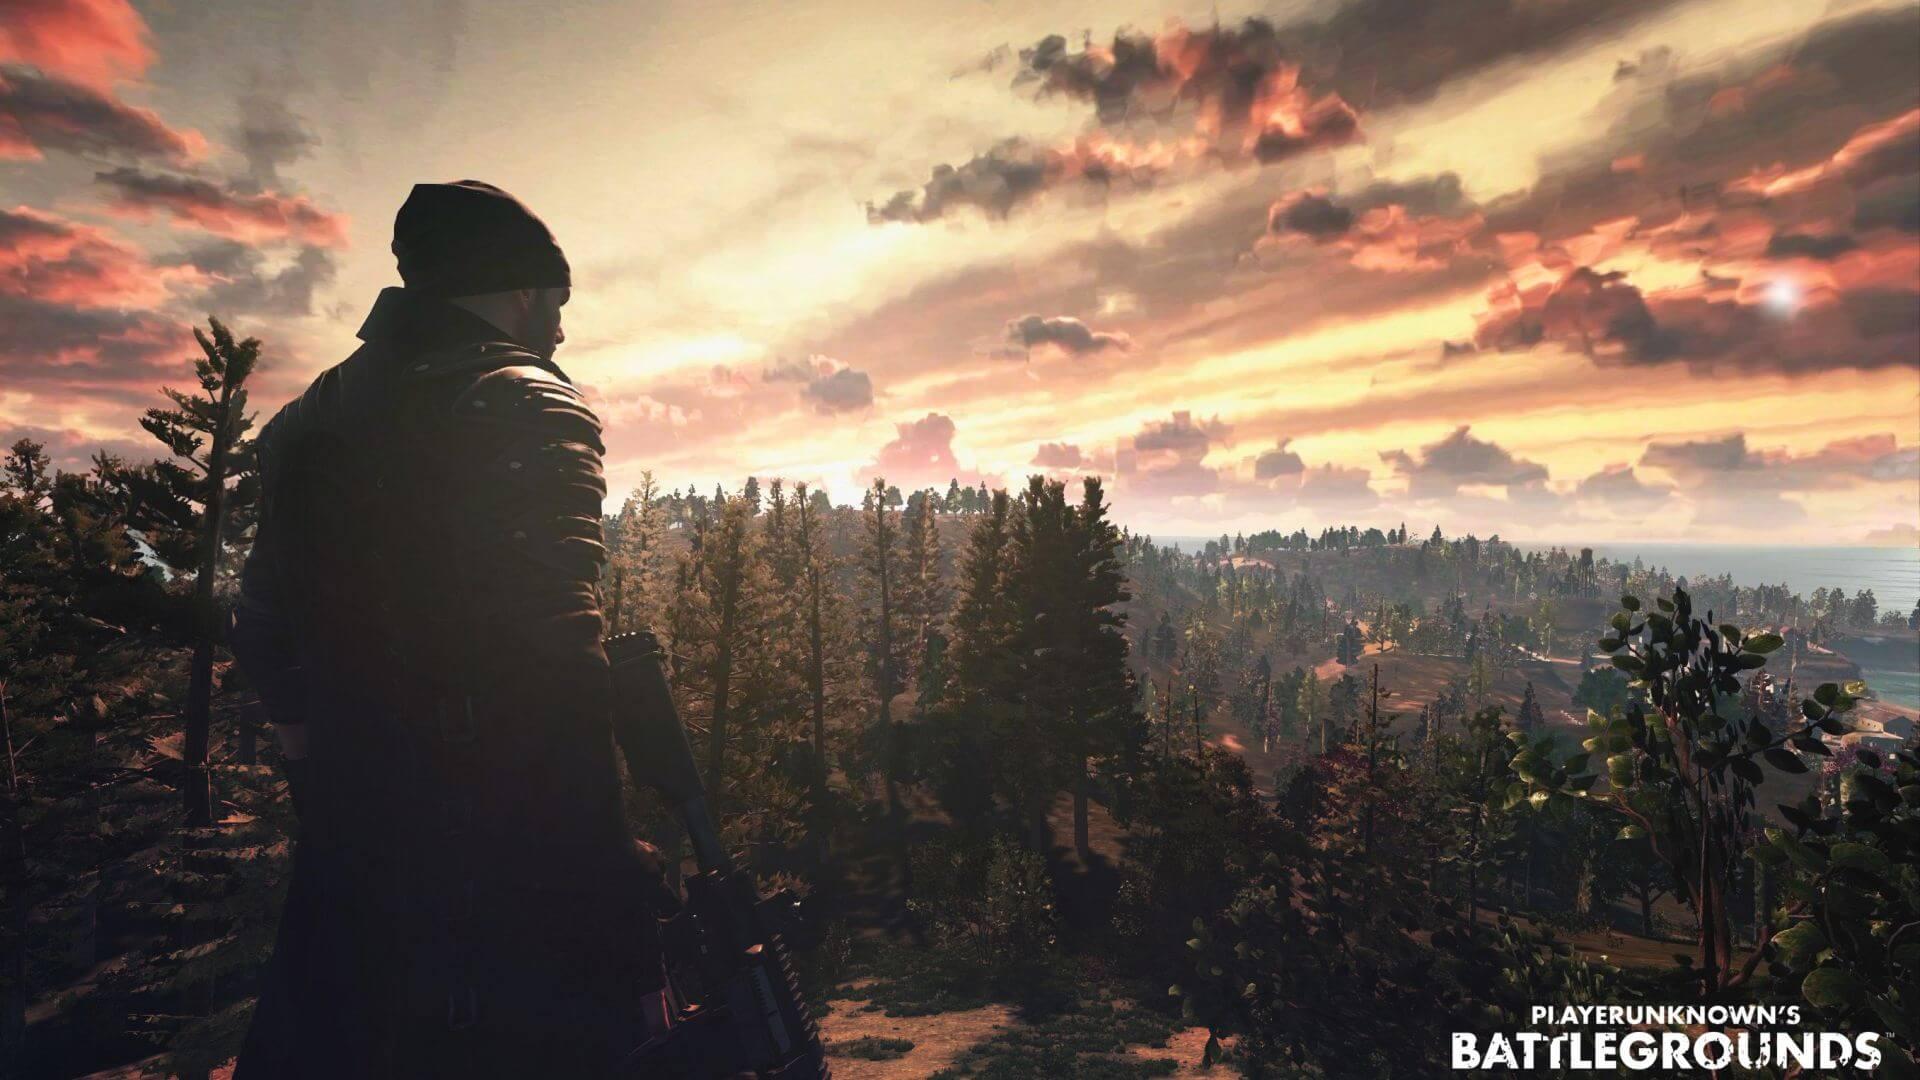 playerunknowns battlegrounds key download free